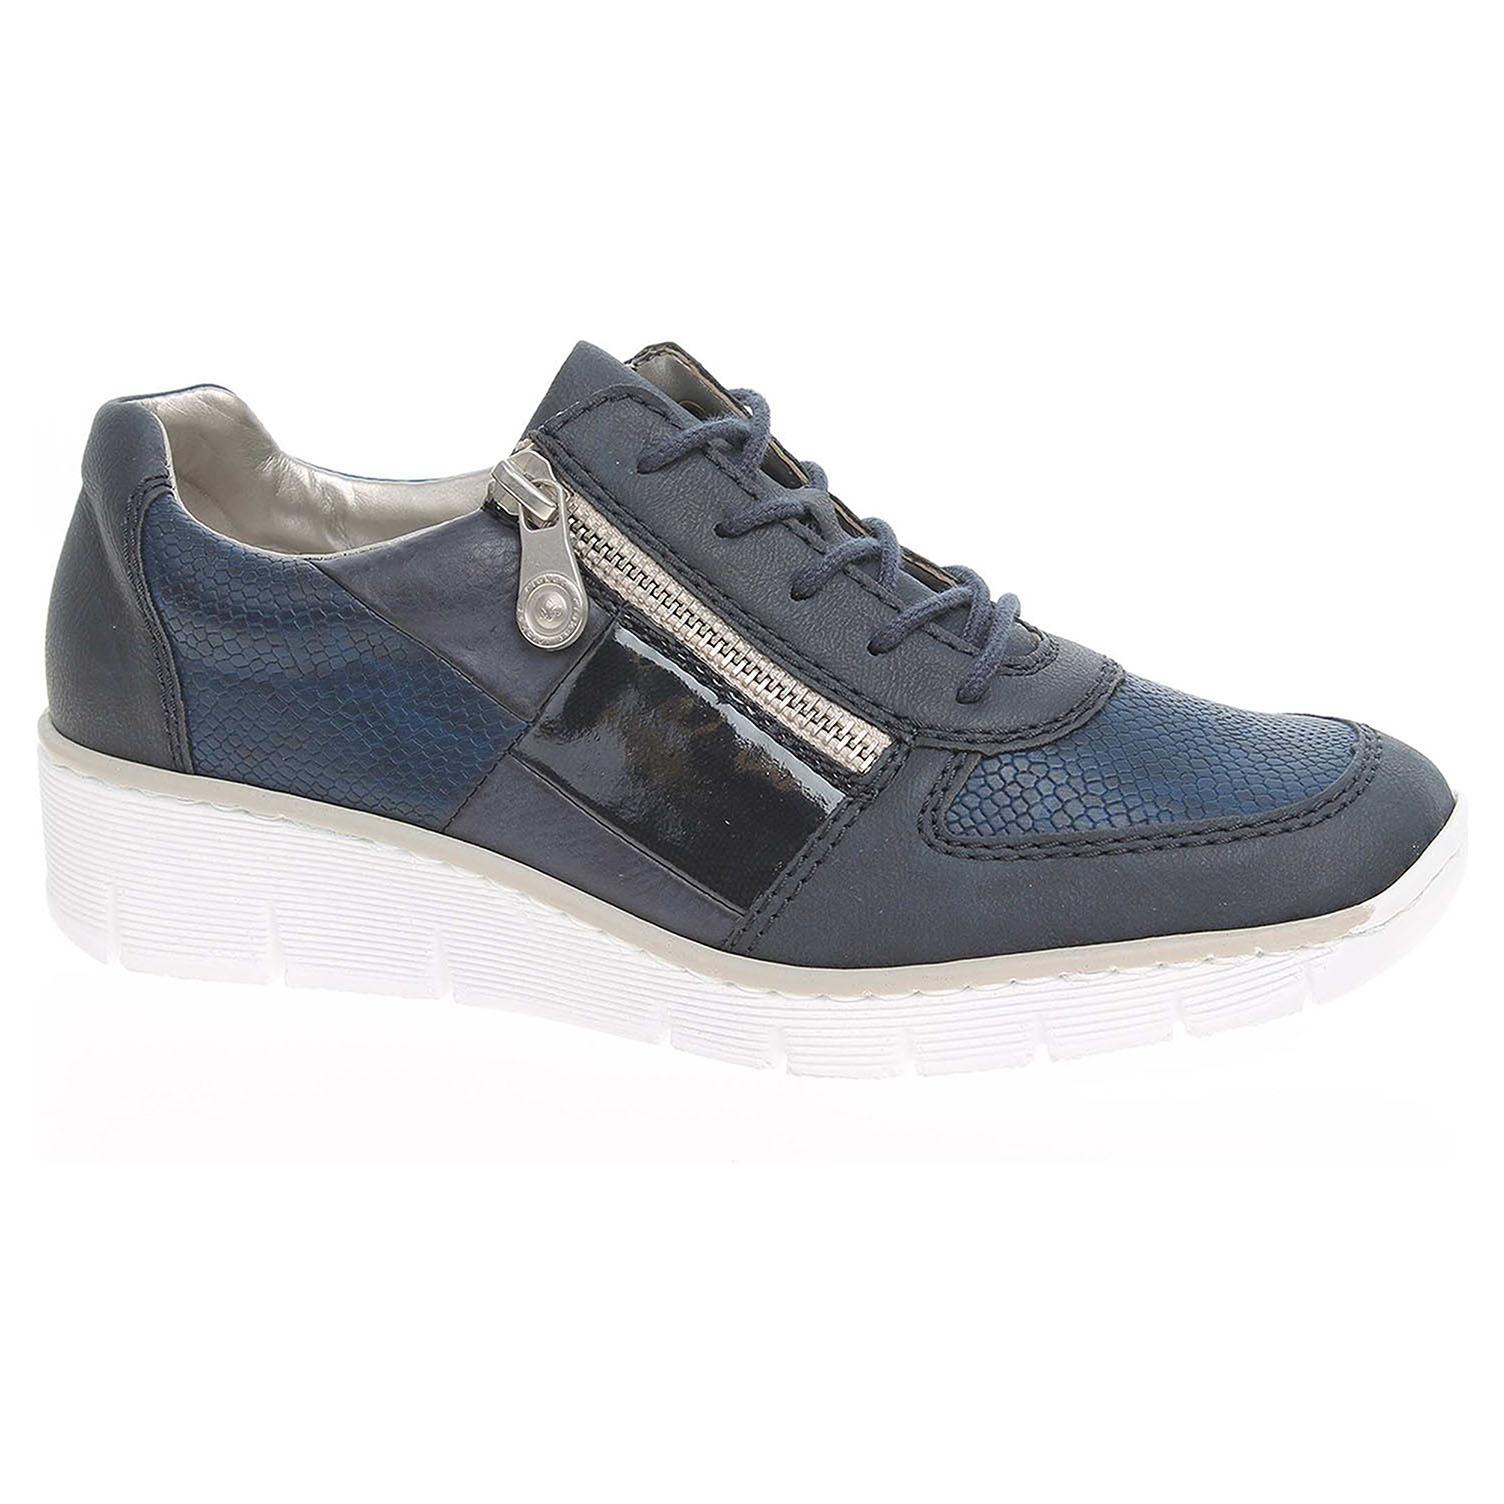 Dámská obuv Rieker 53714-14 modrá 42